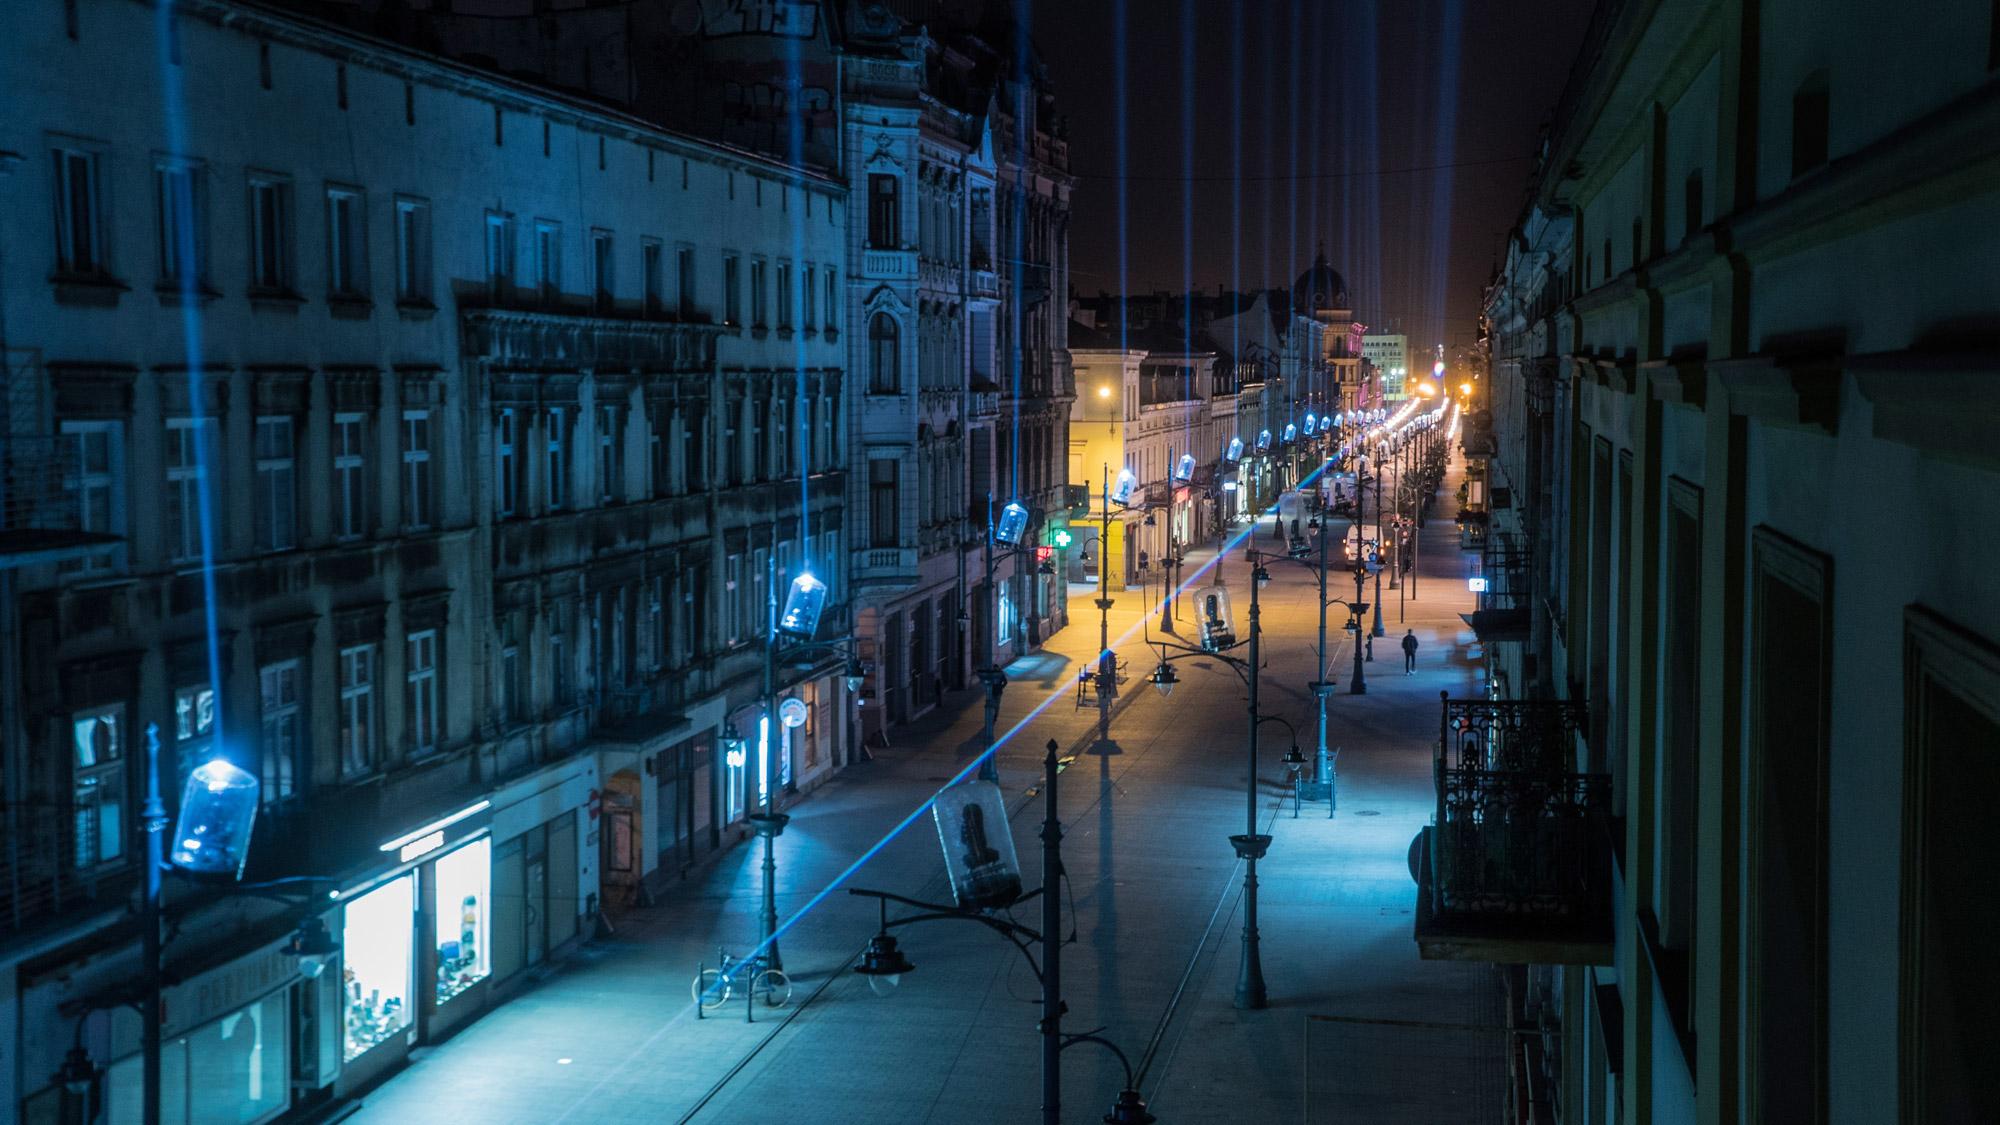 Light Installation & Street Art in Łódź, Poland